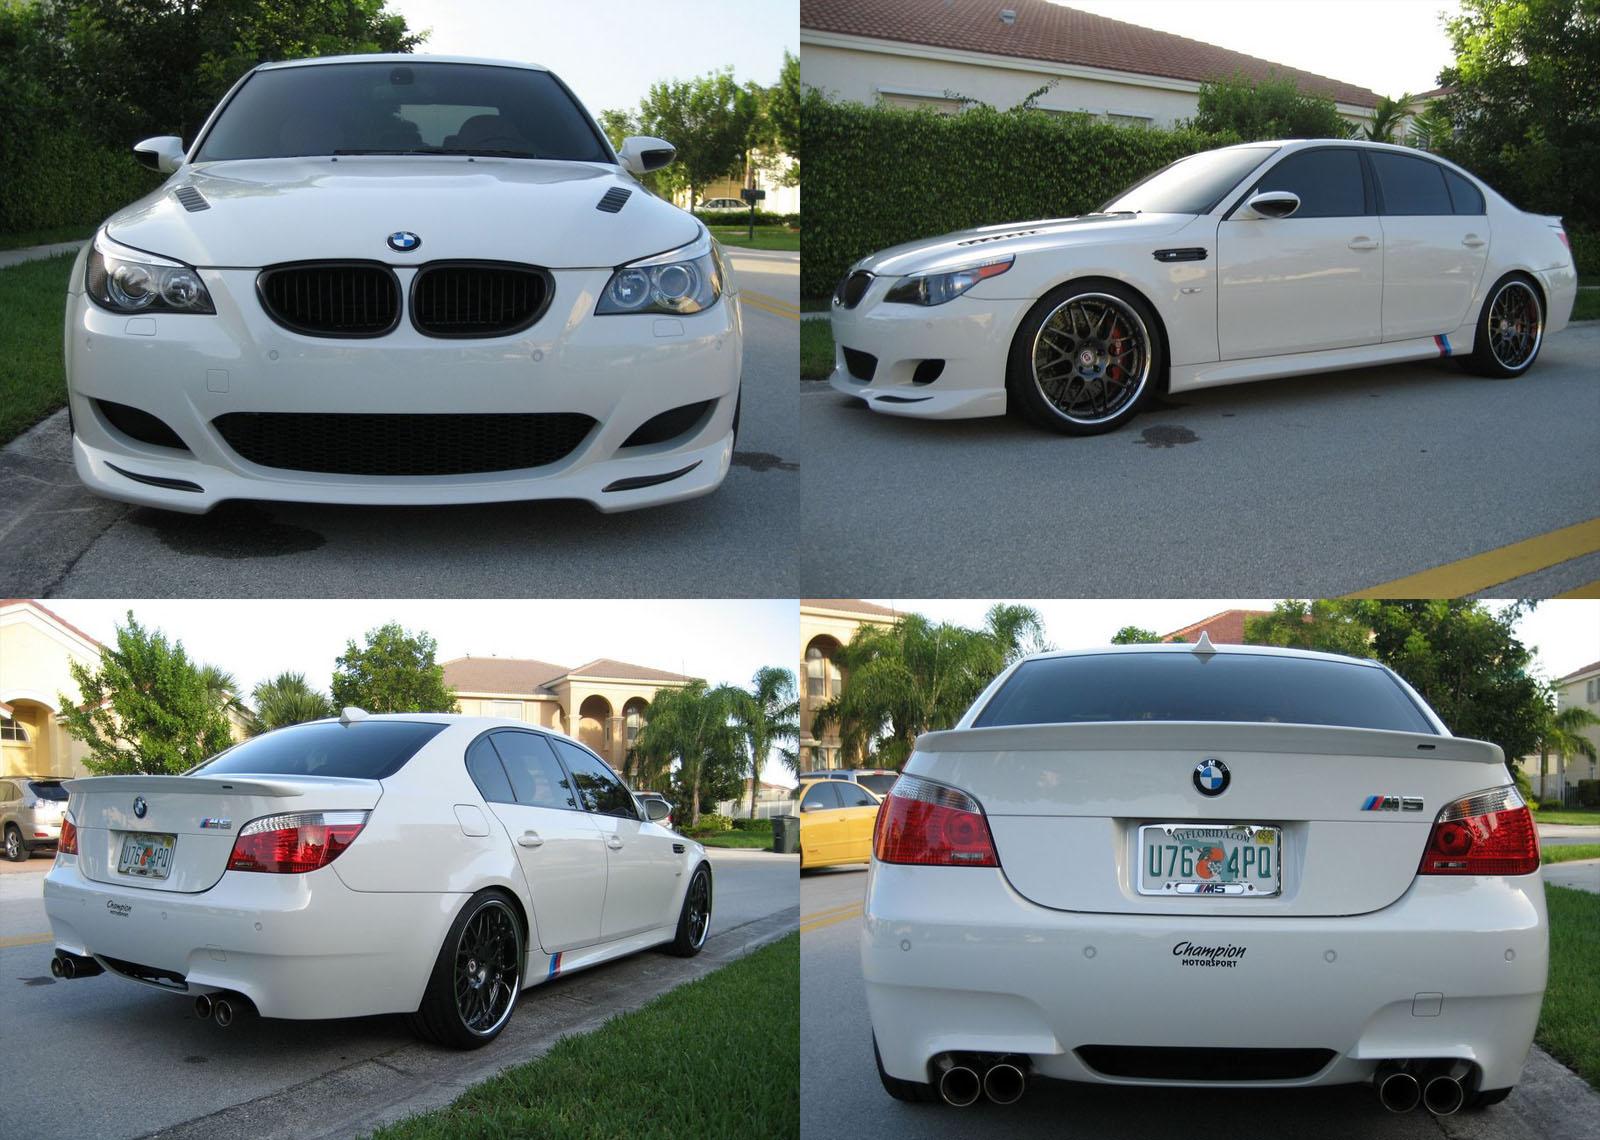 http://3.bp.blogspot.com/-Hiv_2MoH19s/TuZeeAYIkII/AAAAAAAAFqs/nC1dqiQ3HlM/s1600/BMW+M5.jpg